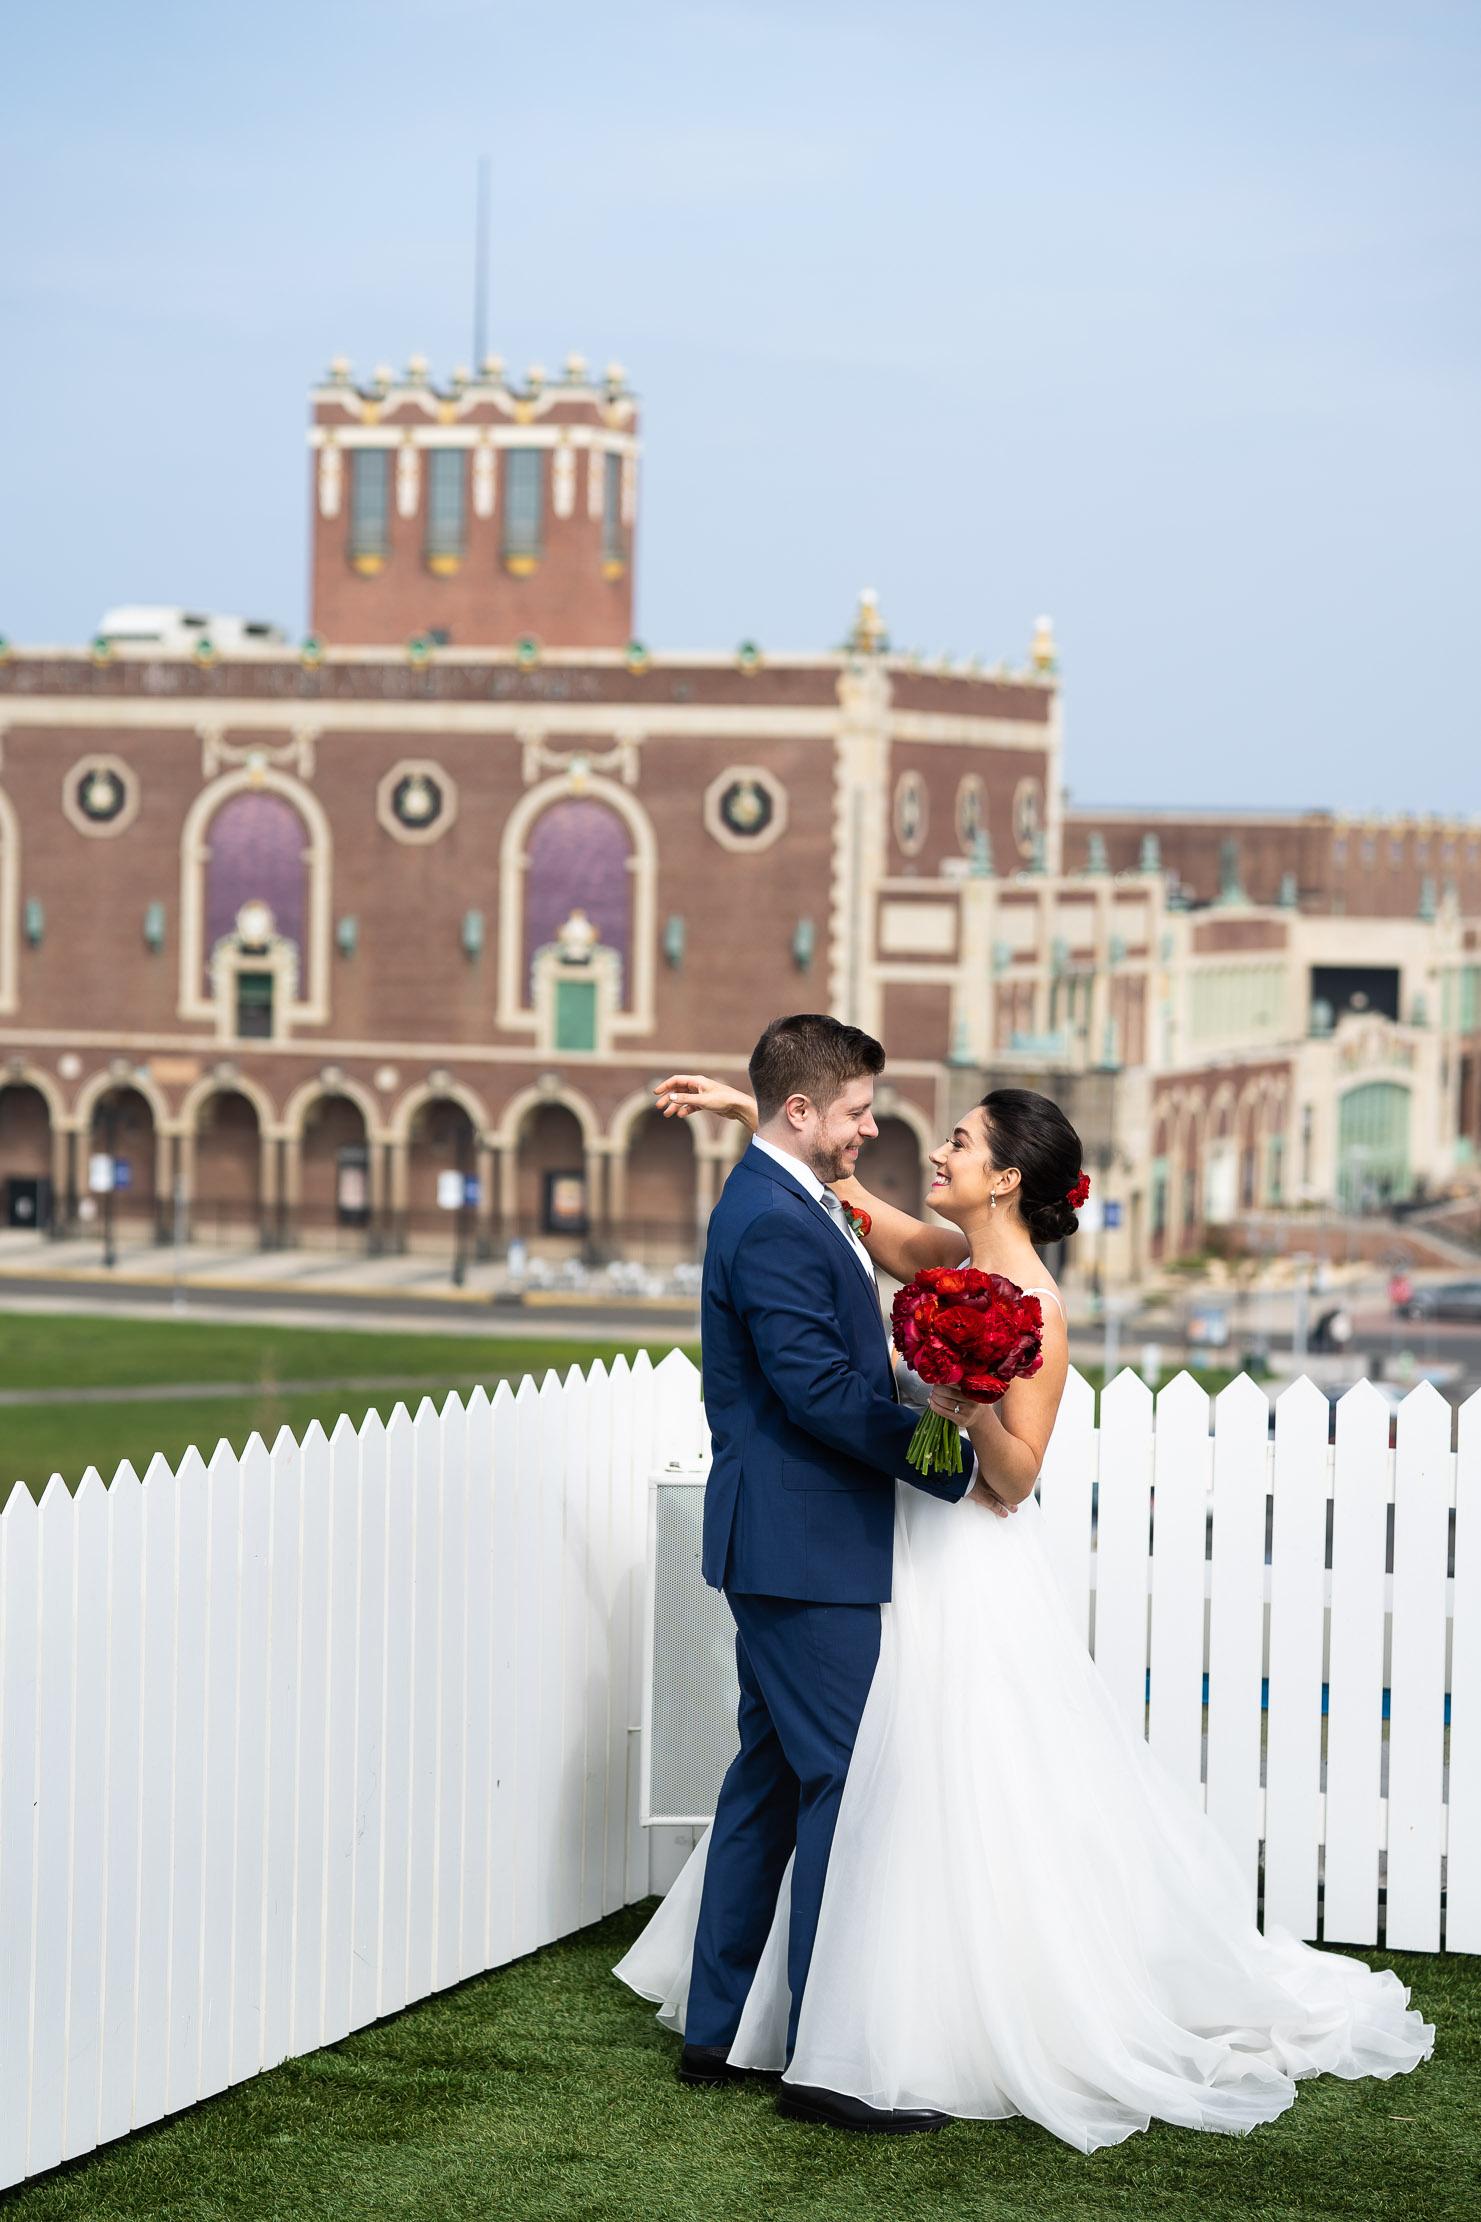 Asbury-Park-Convention-Hall-Wedding-2023.jpg